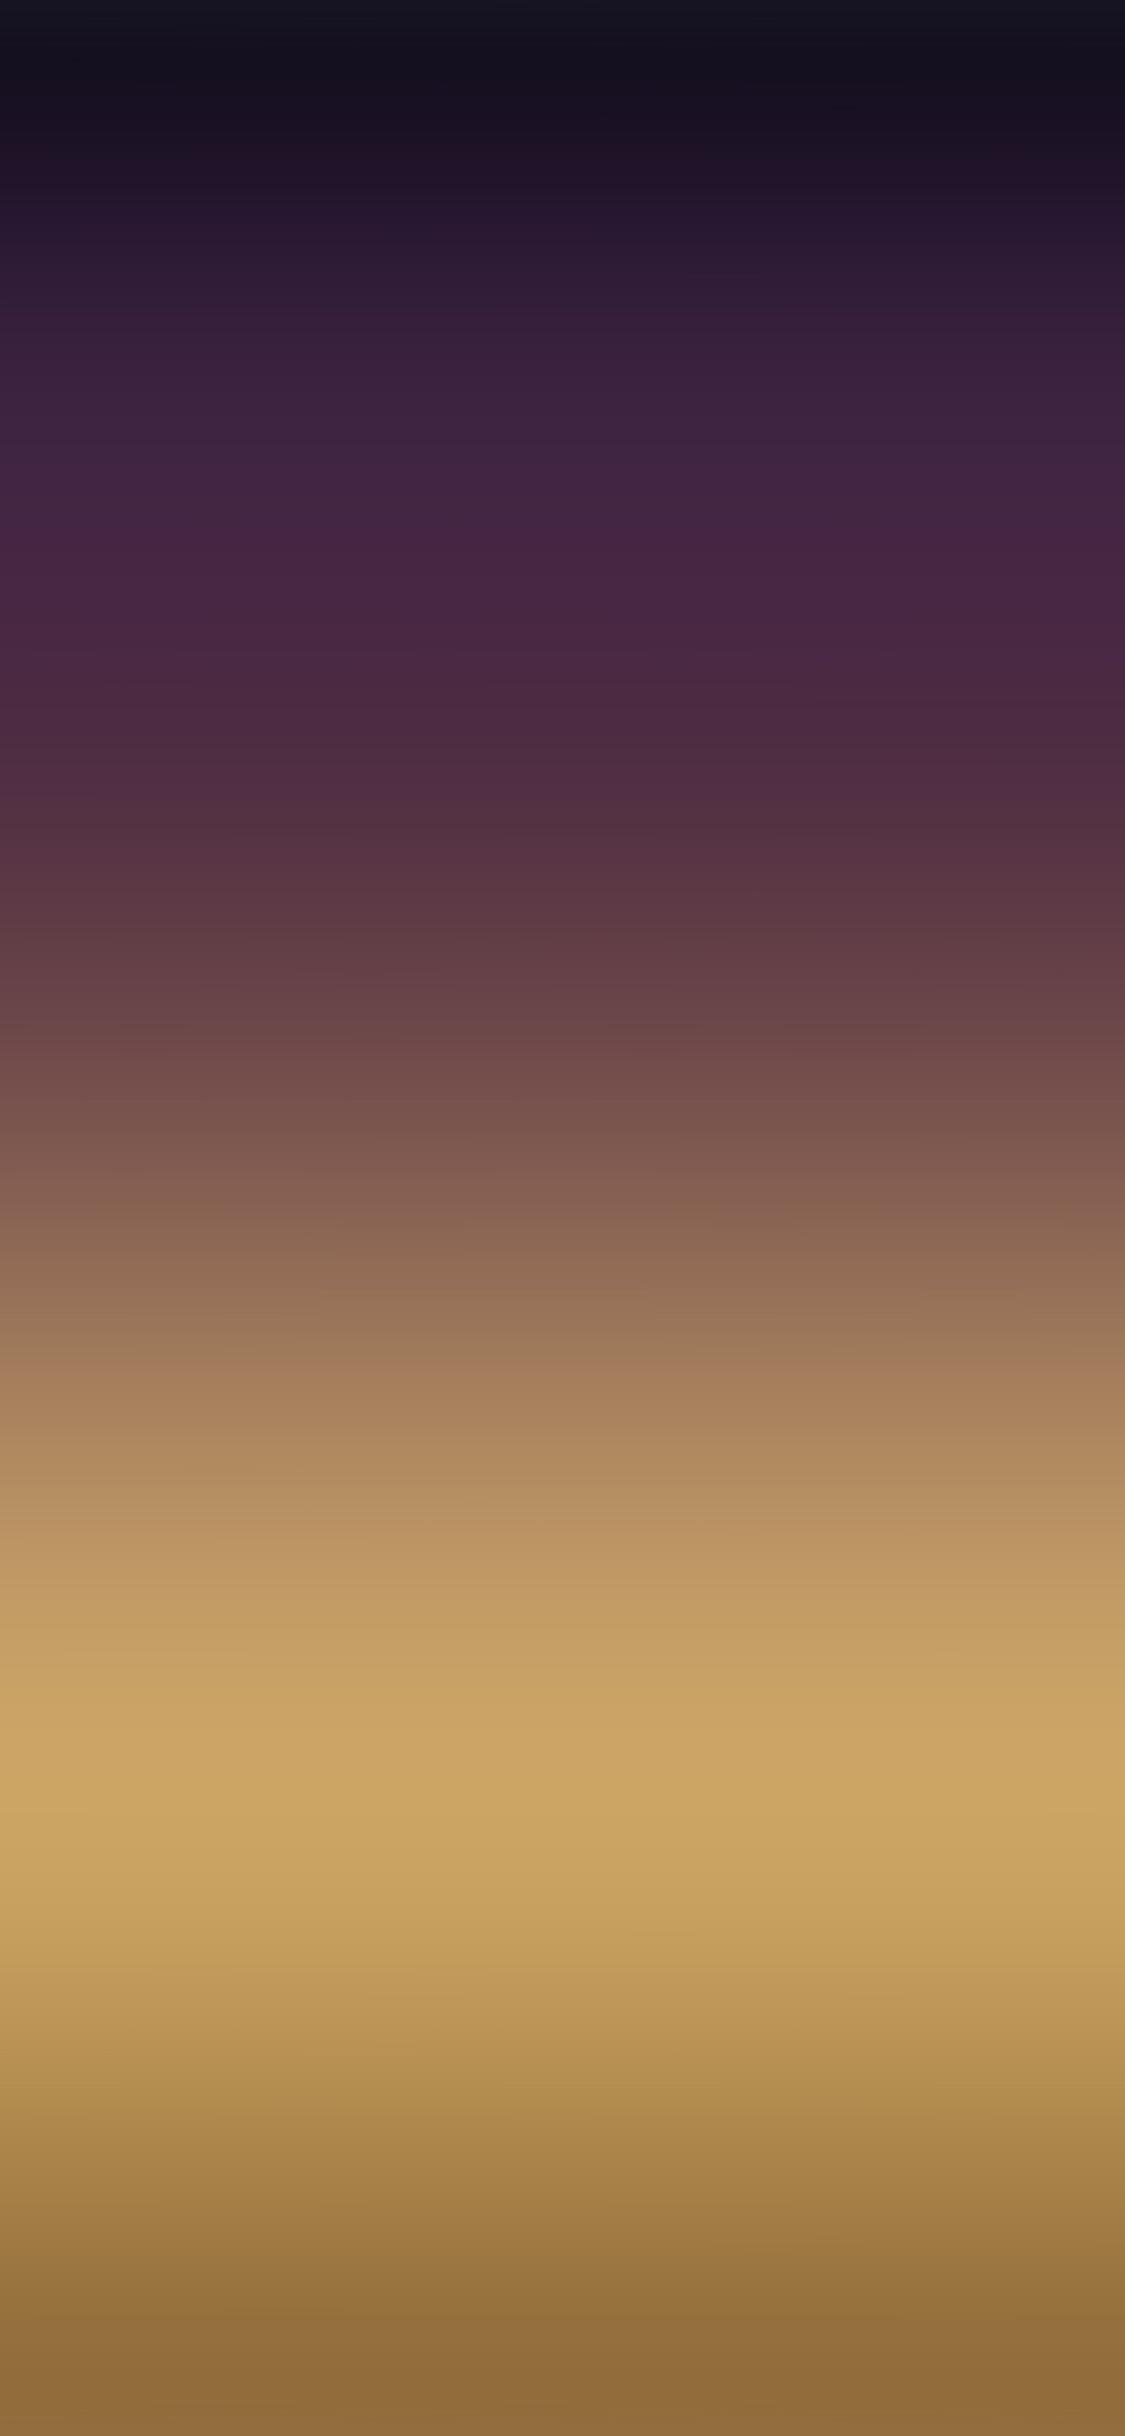 iPhoneXpapers.com-Apple-iPhone-wallpaper-sl50-purple-soft-blur-gradation